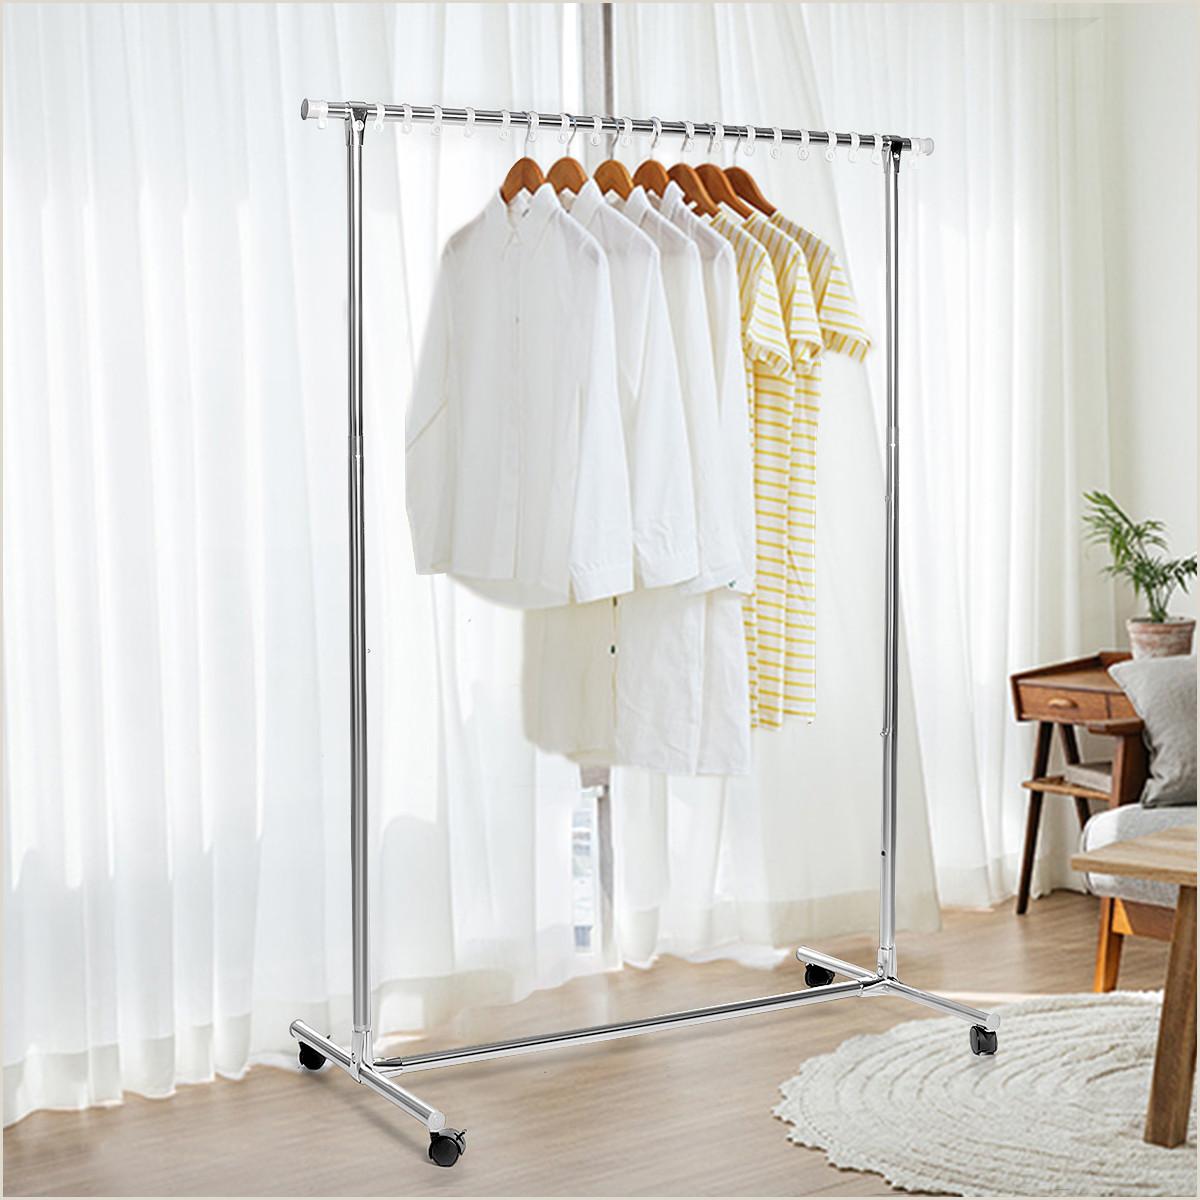 Floor Banners Retractable Clothes Rail Rack Garment Dress Hanging Display Stand Shoe Rack Storage